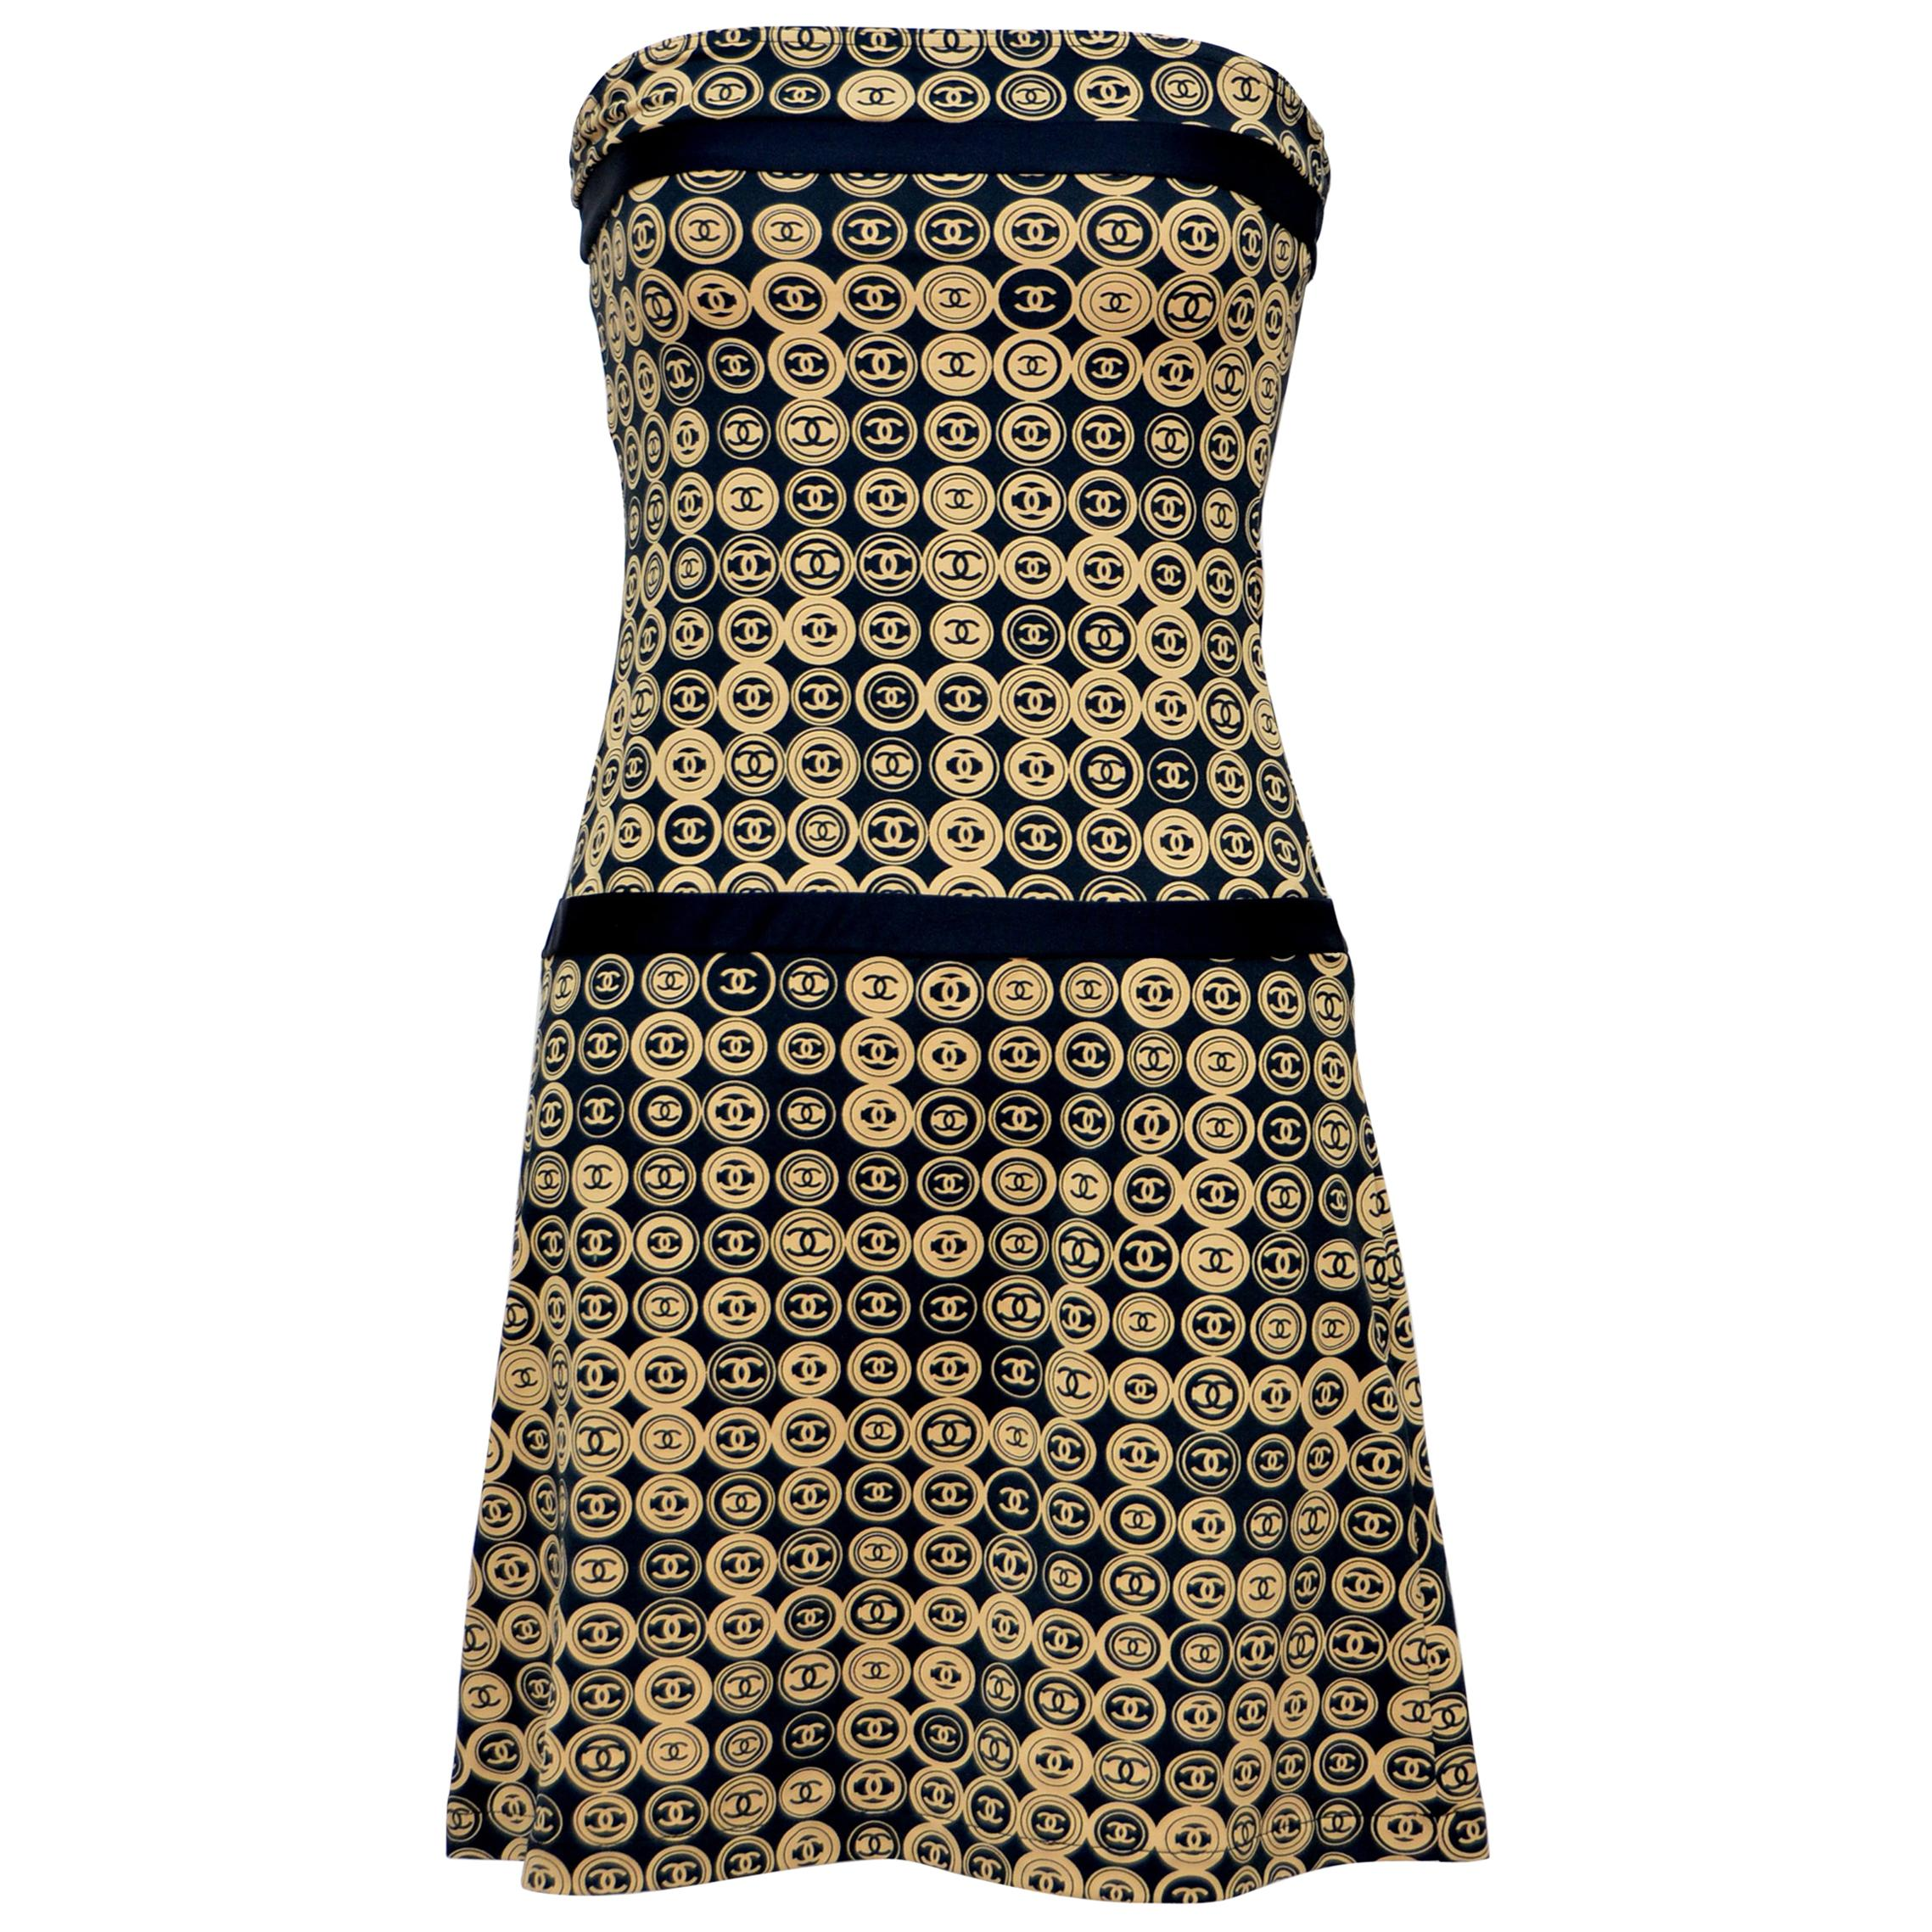 Haute Koture Clothing - 1stdibs